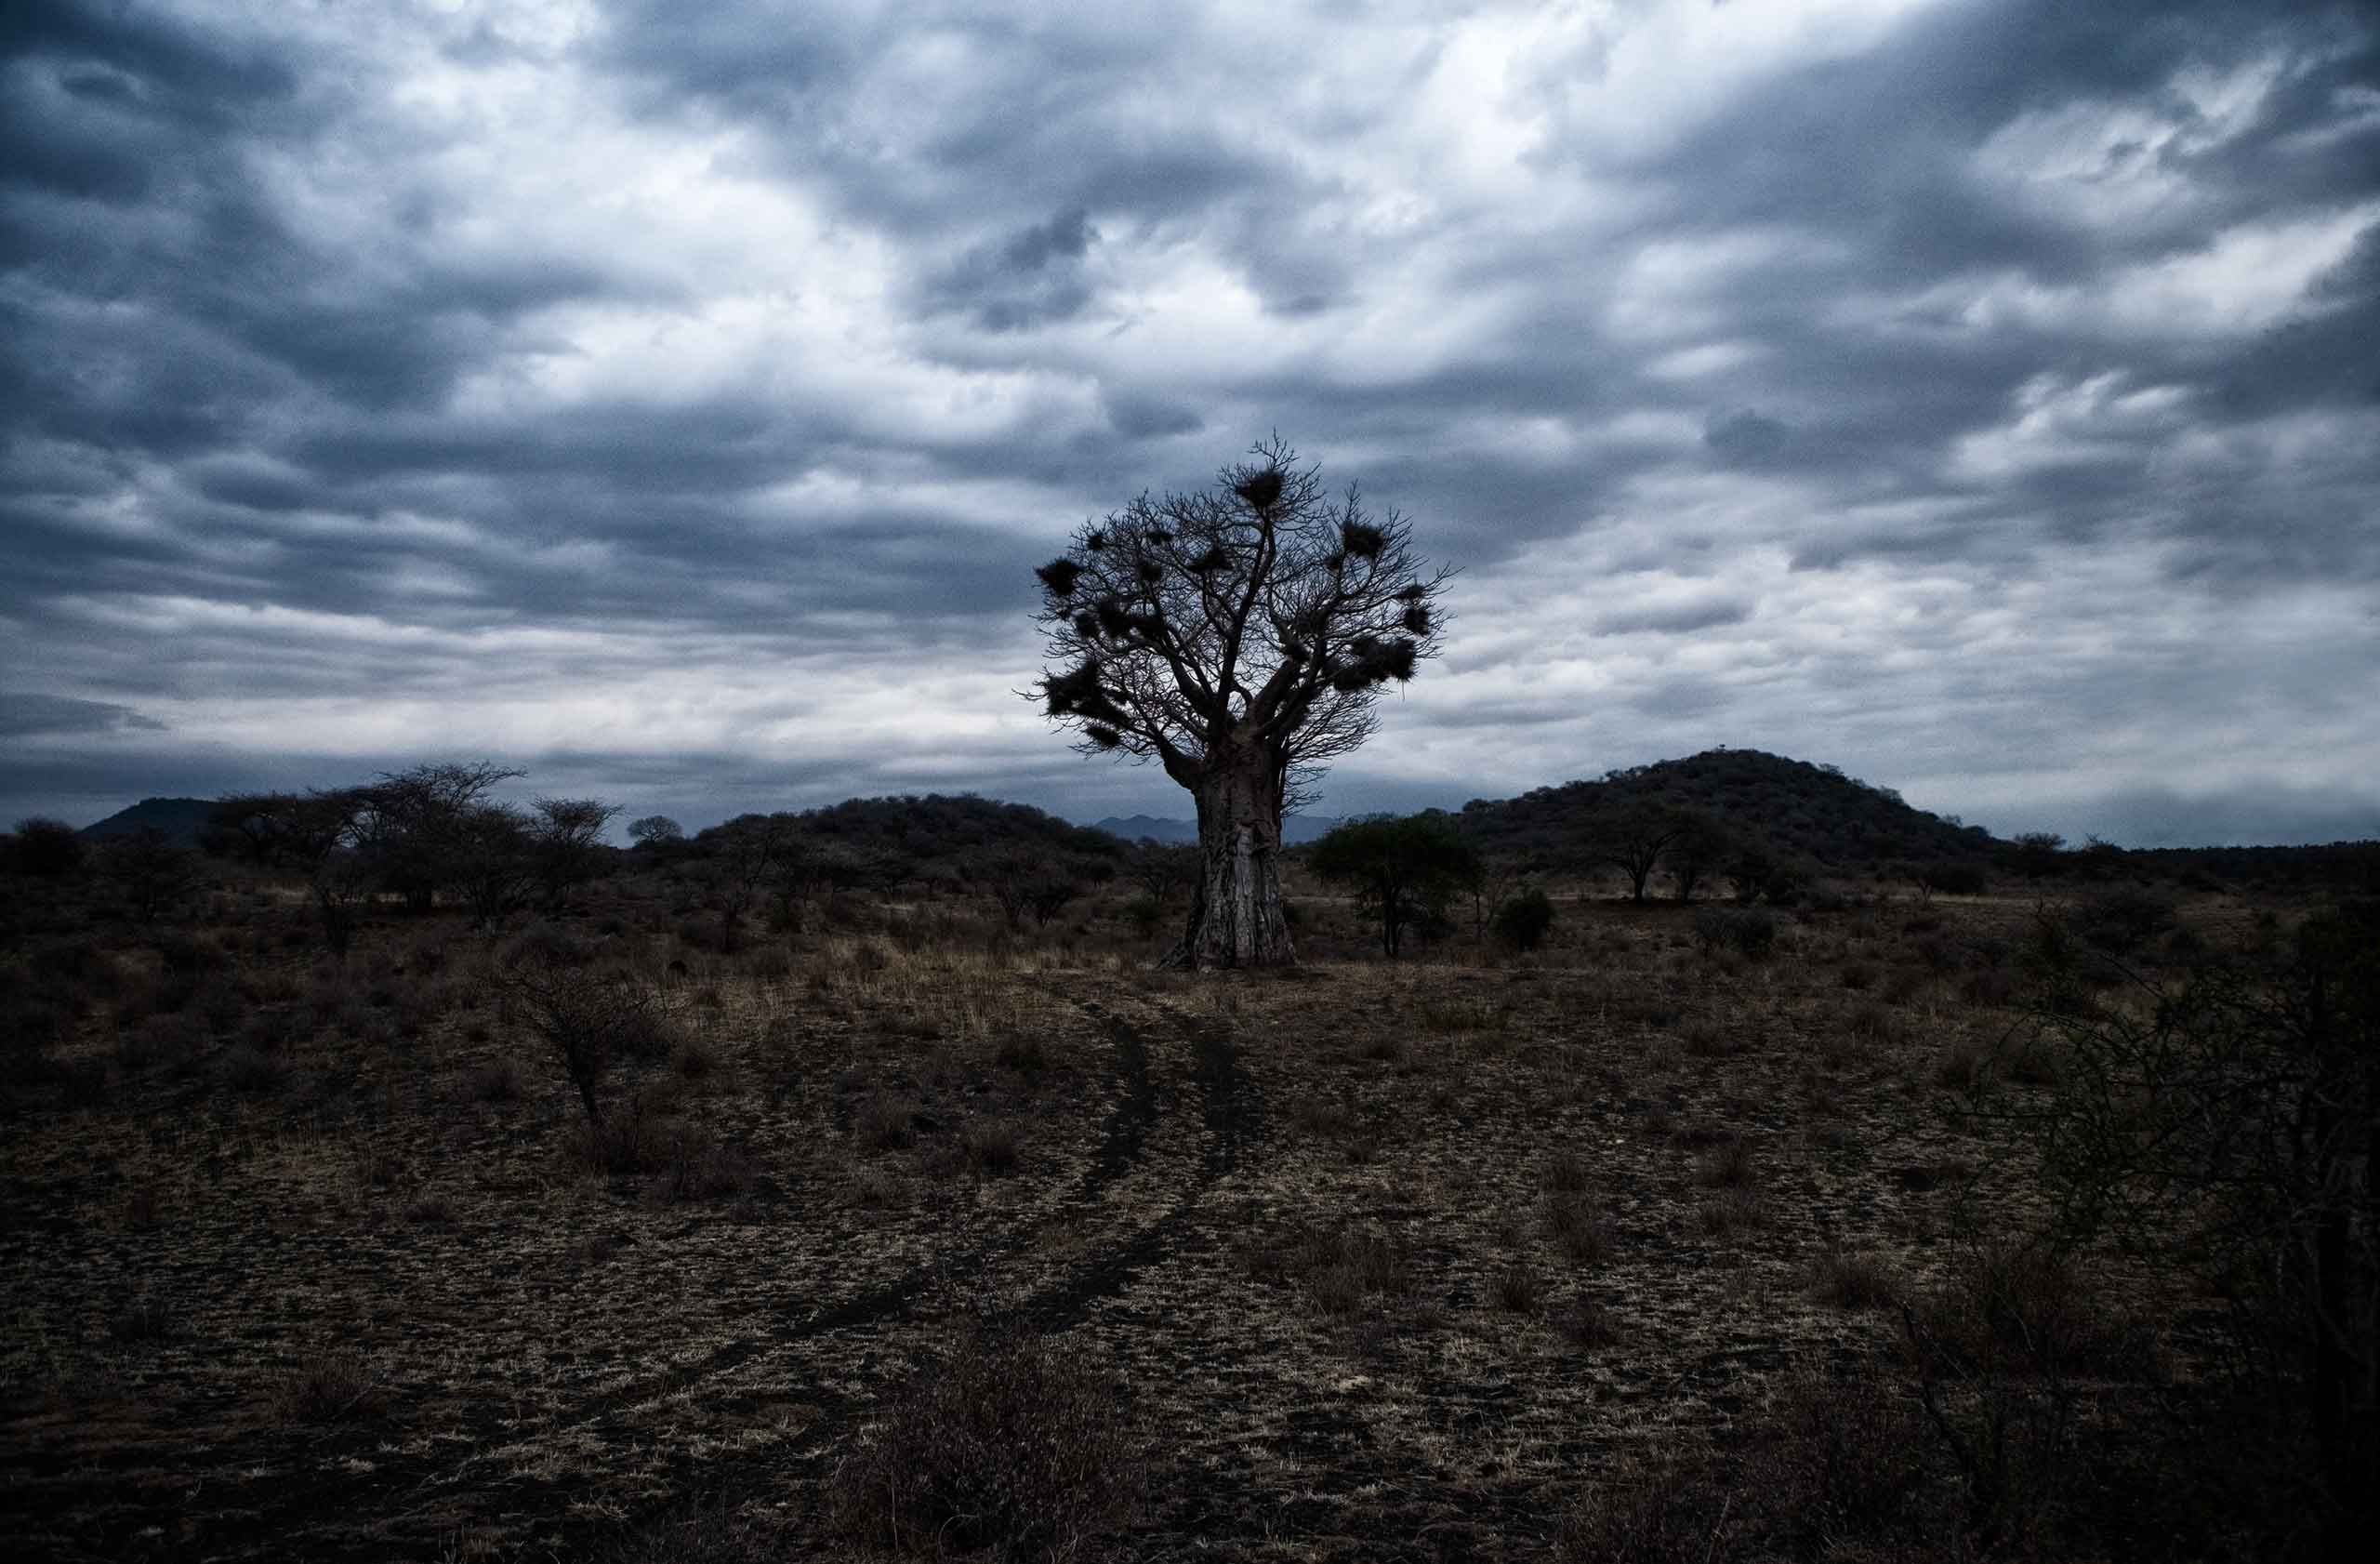 baobob-tree-kenya-by-henrikolundphotography.jpg